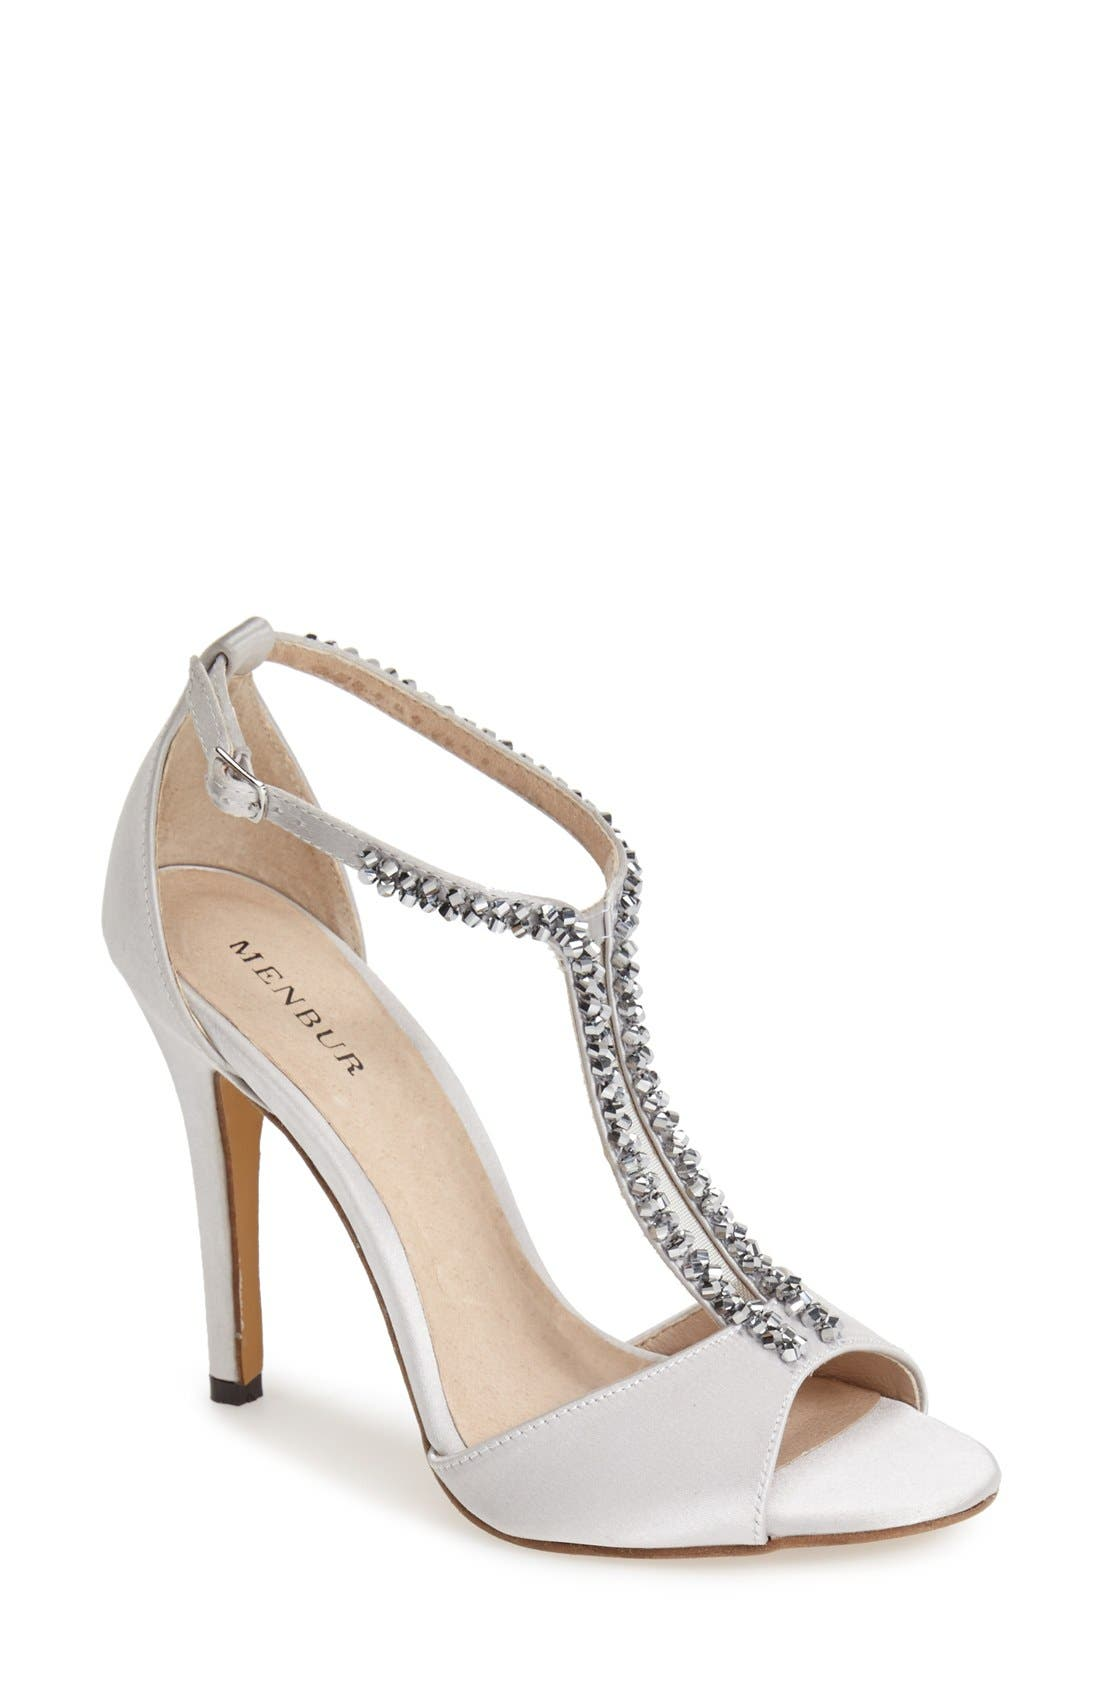 MENBUR 'Albunol' T-Strap Sandal